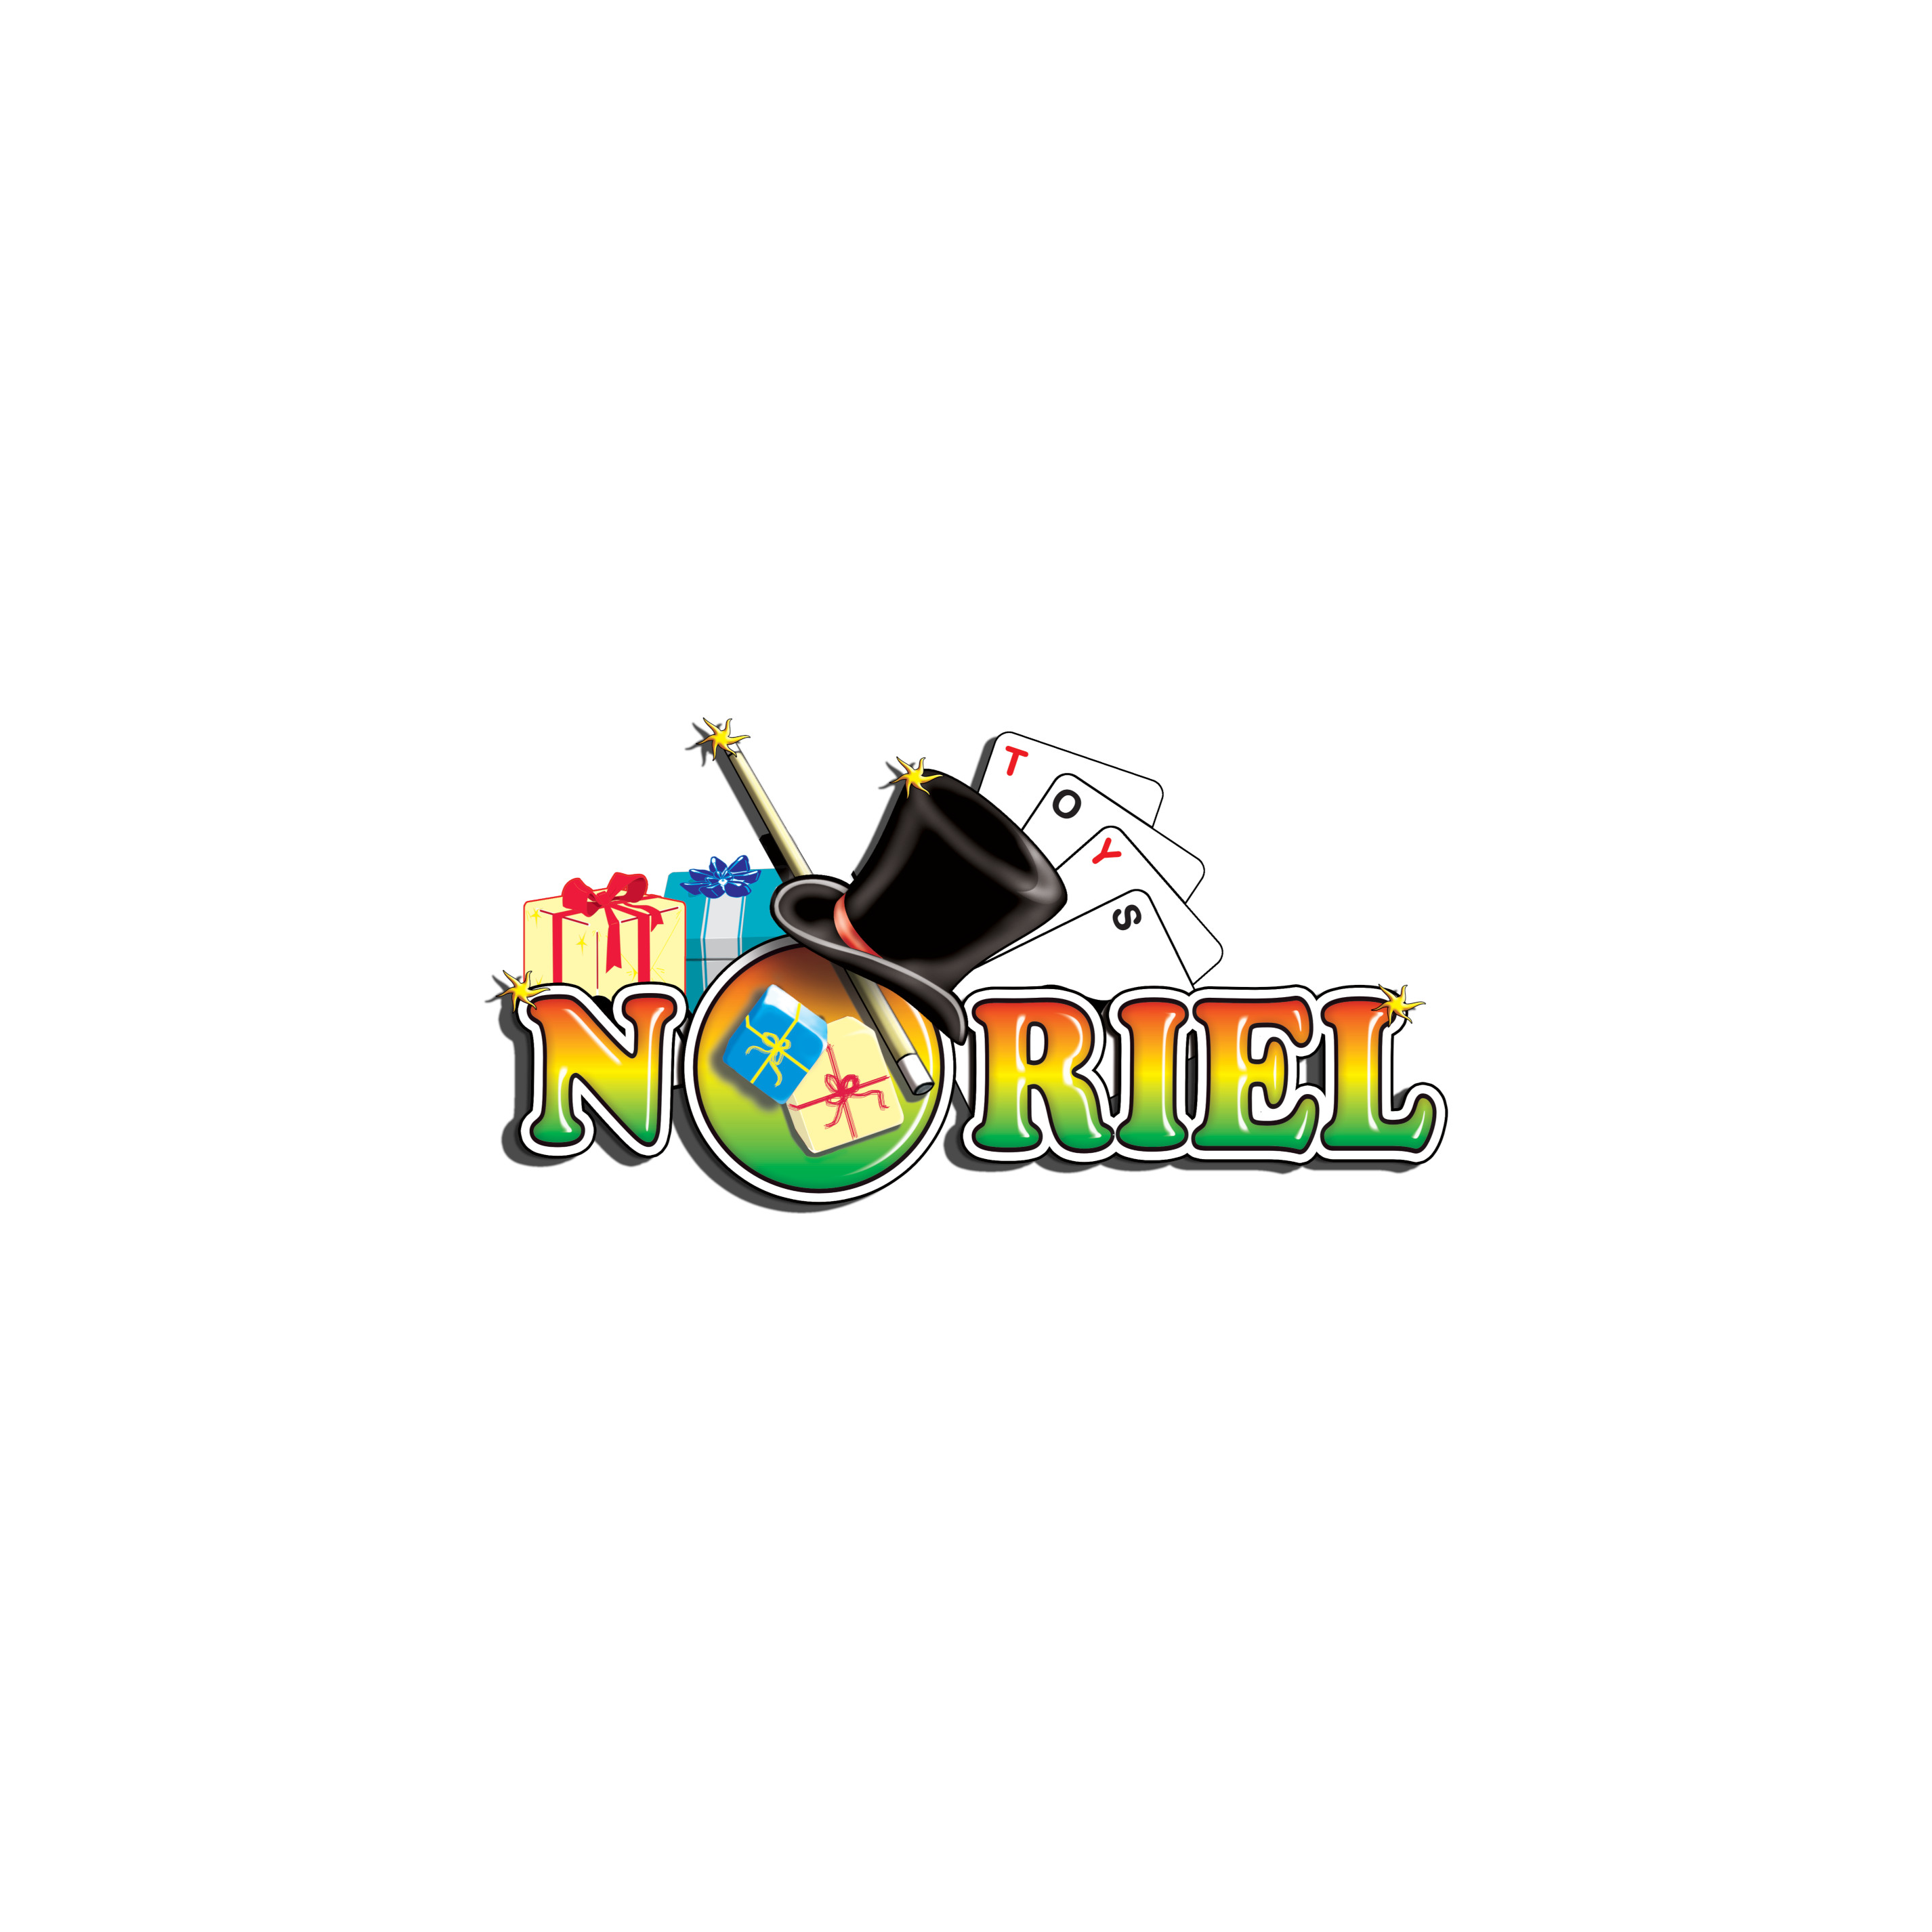 Joc de creativitate Micul Artist, Proiector 3 in 1 INT5720